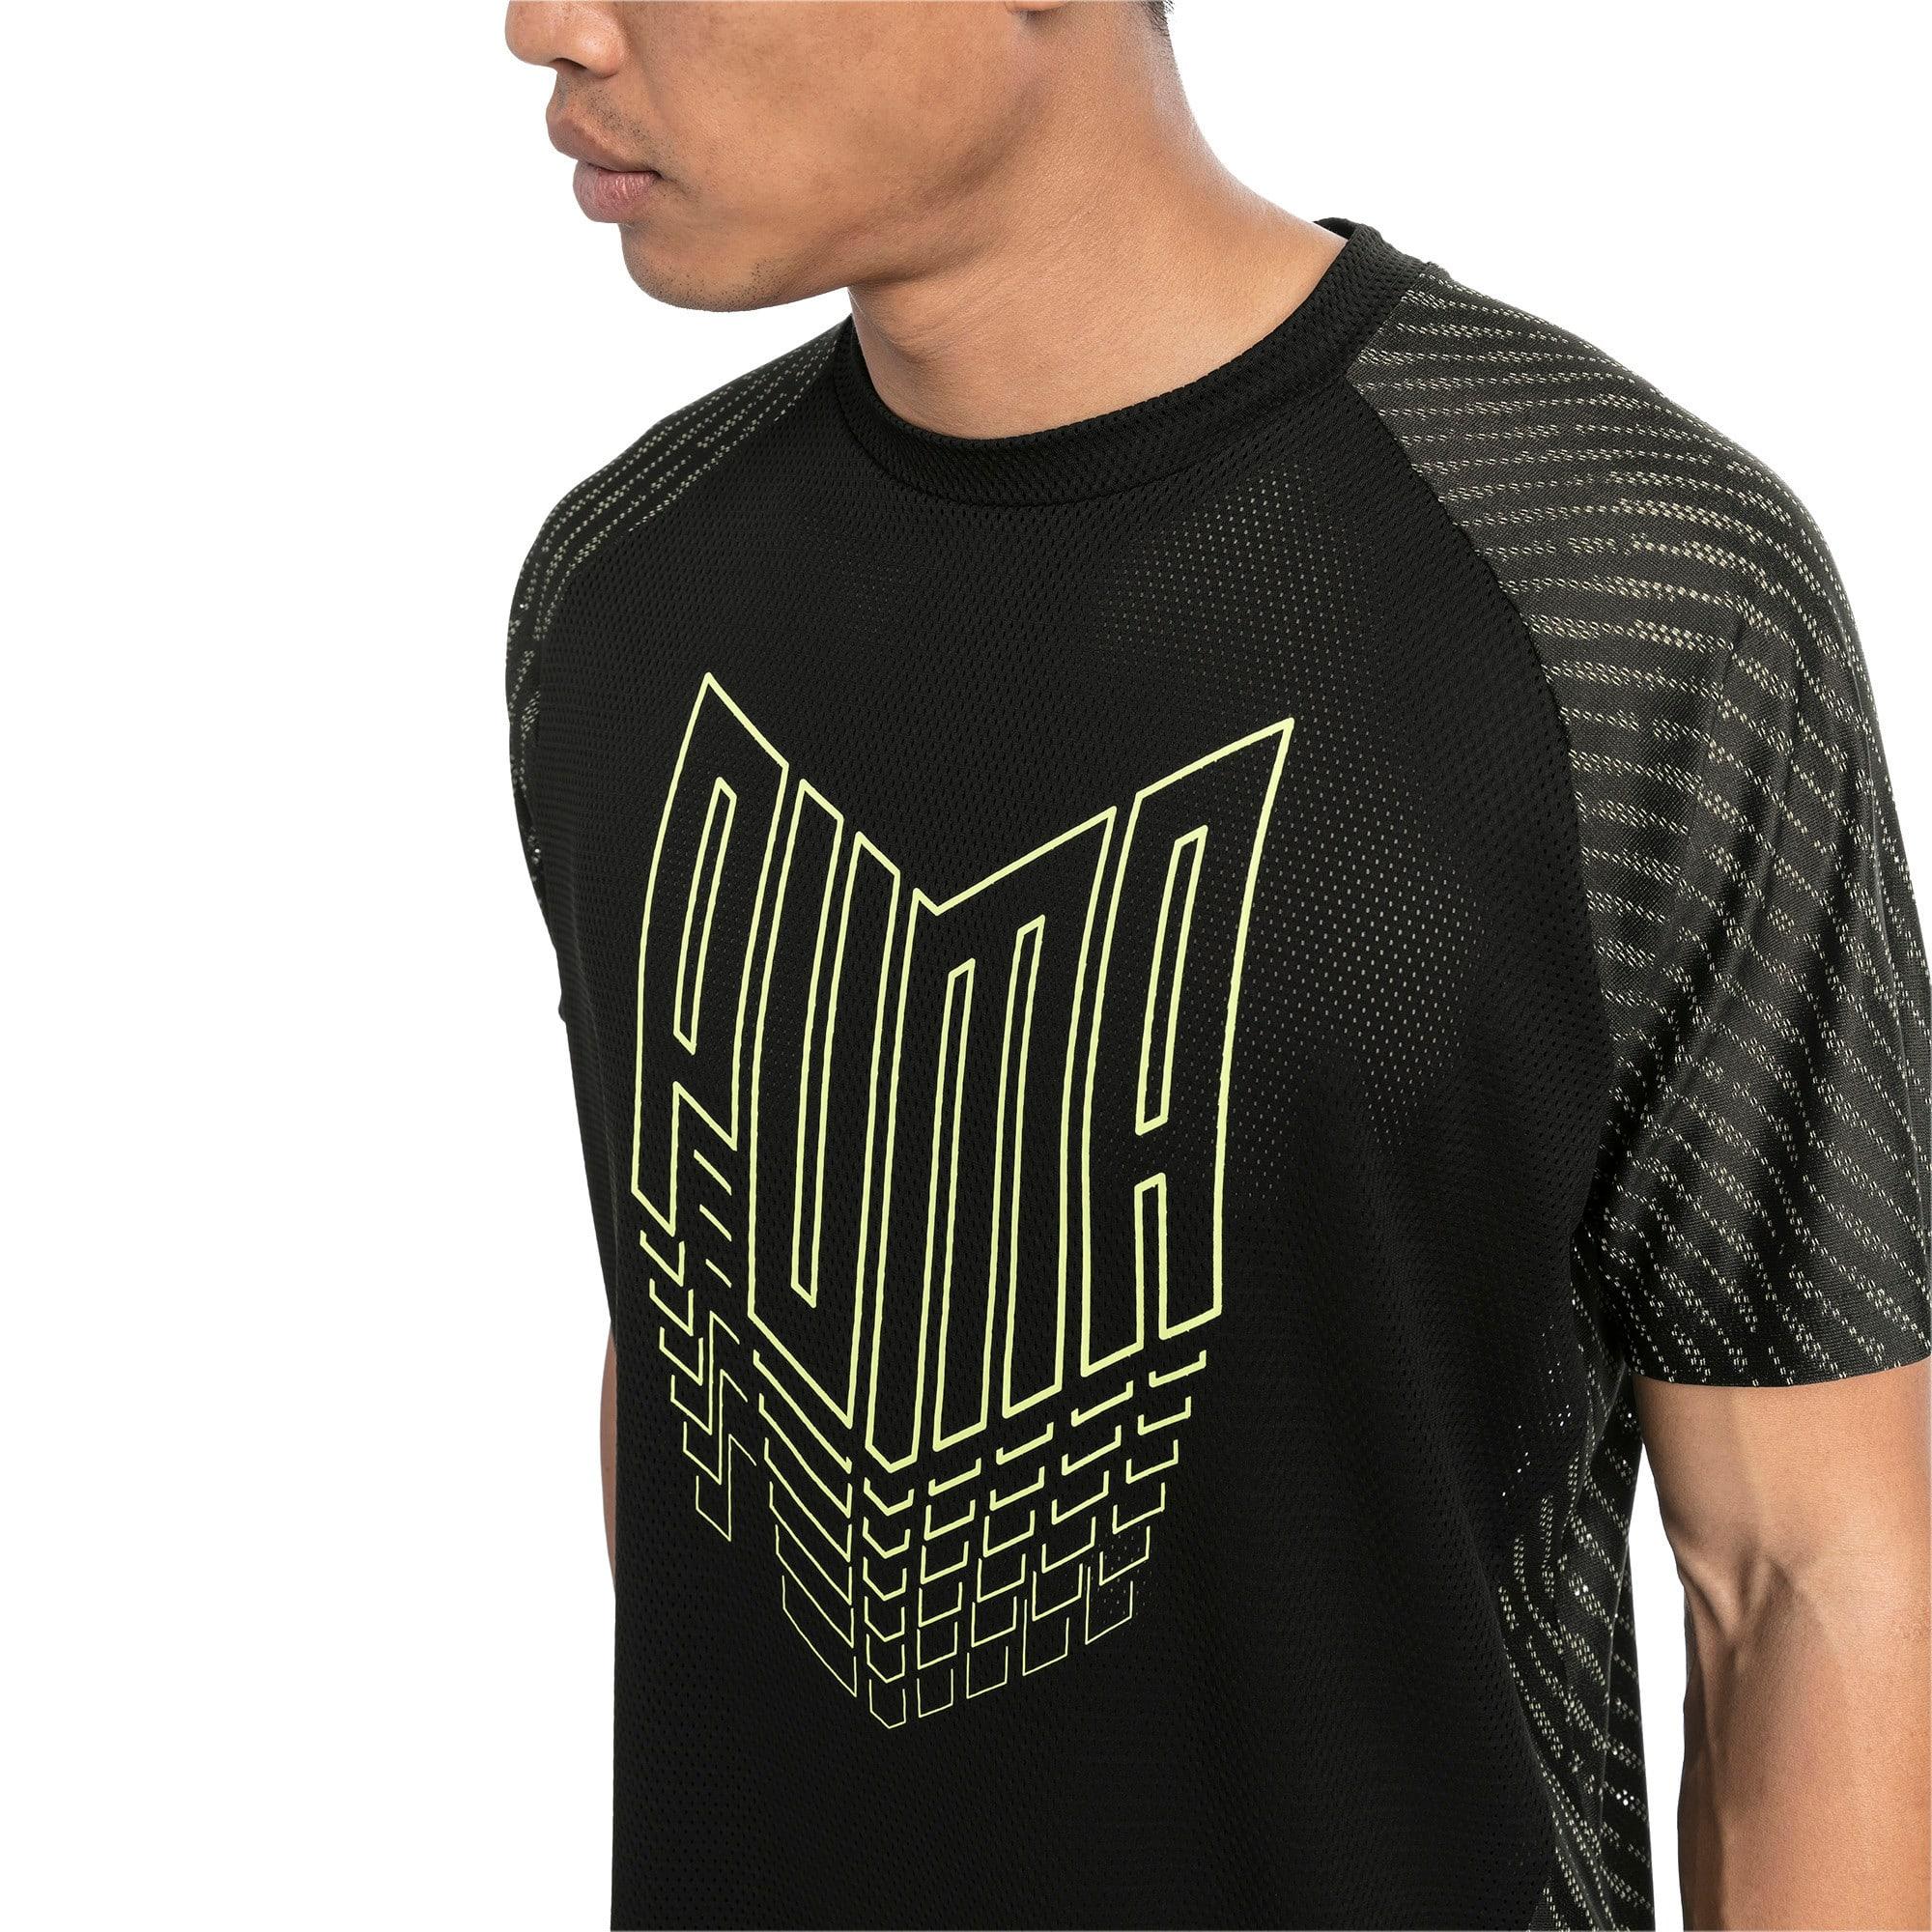 Thumbnail 1 of VENT Herren Trainingsshirt, Puma Black, medium